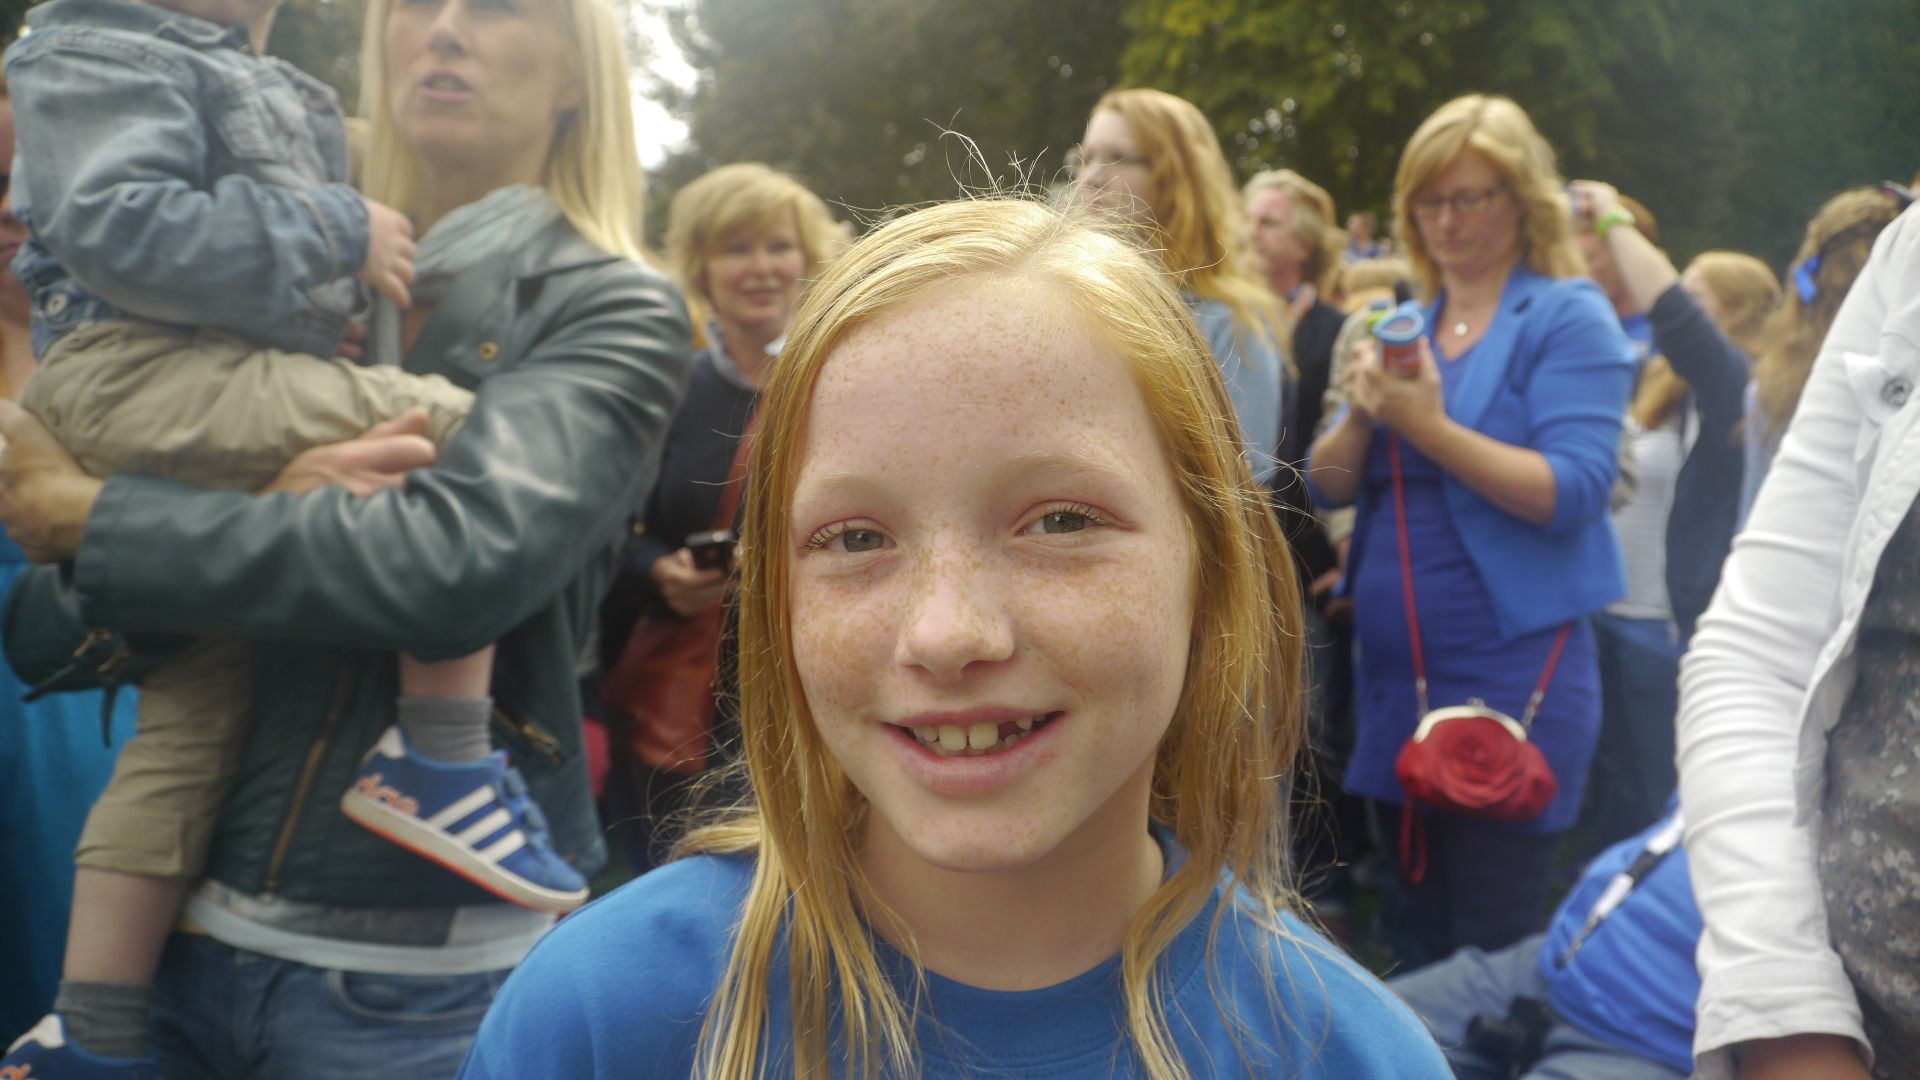 Redhead Days 2013. Photo by Ton van de Merwe